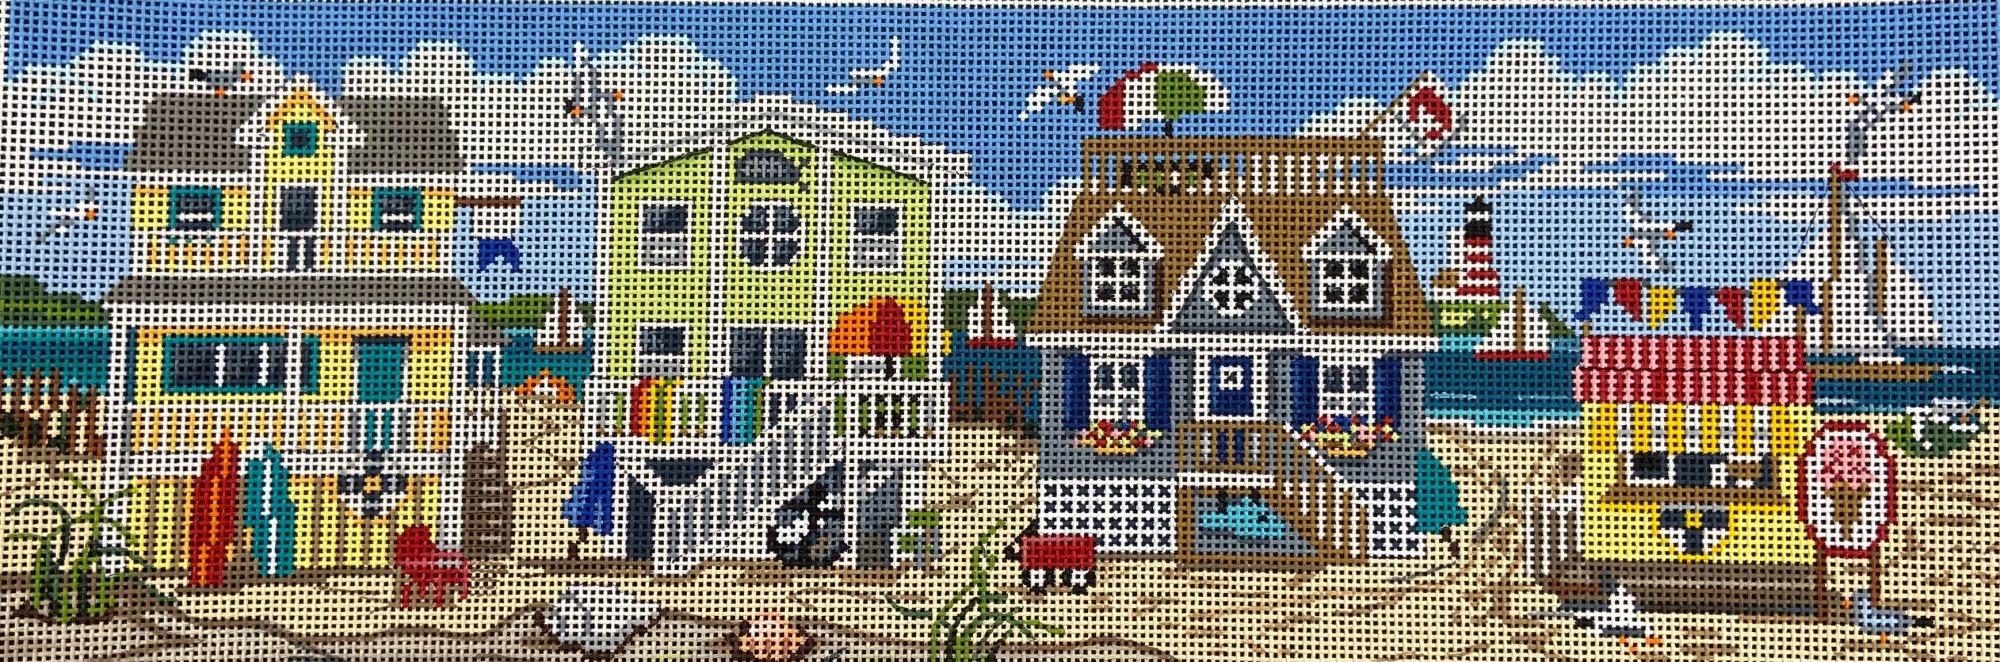 AP2727 Beach House Row Shoreline Alice Peterson